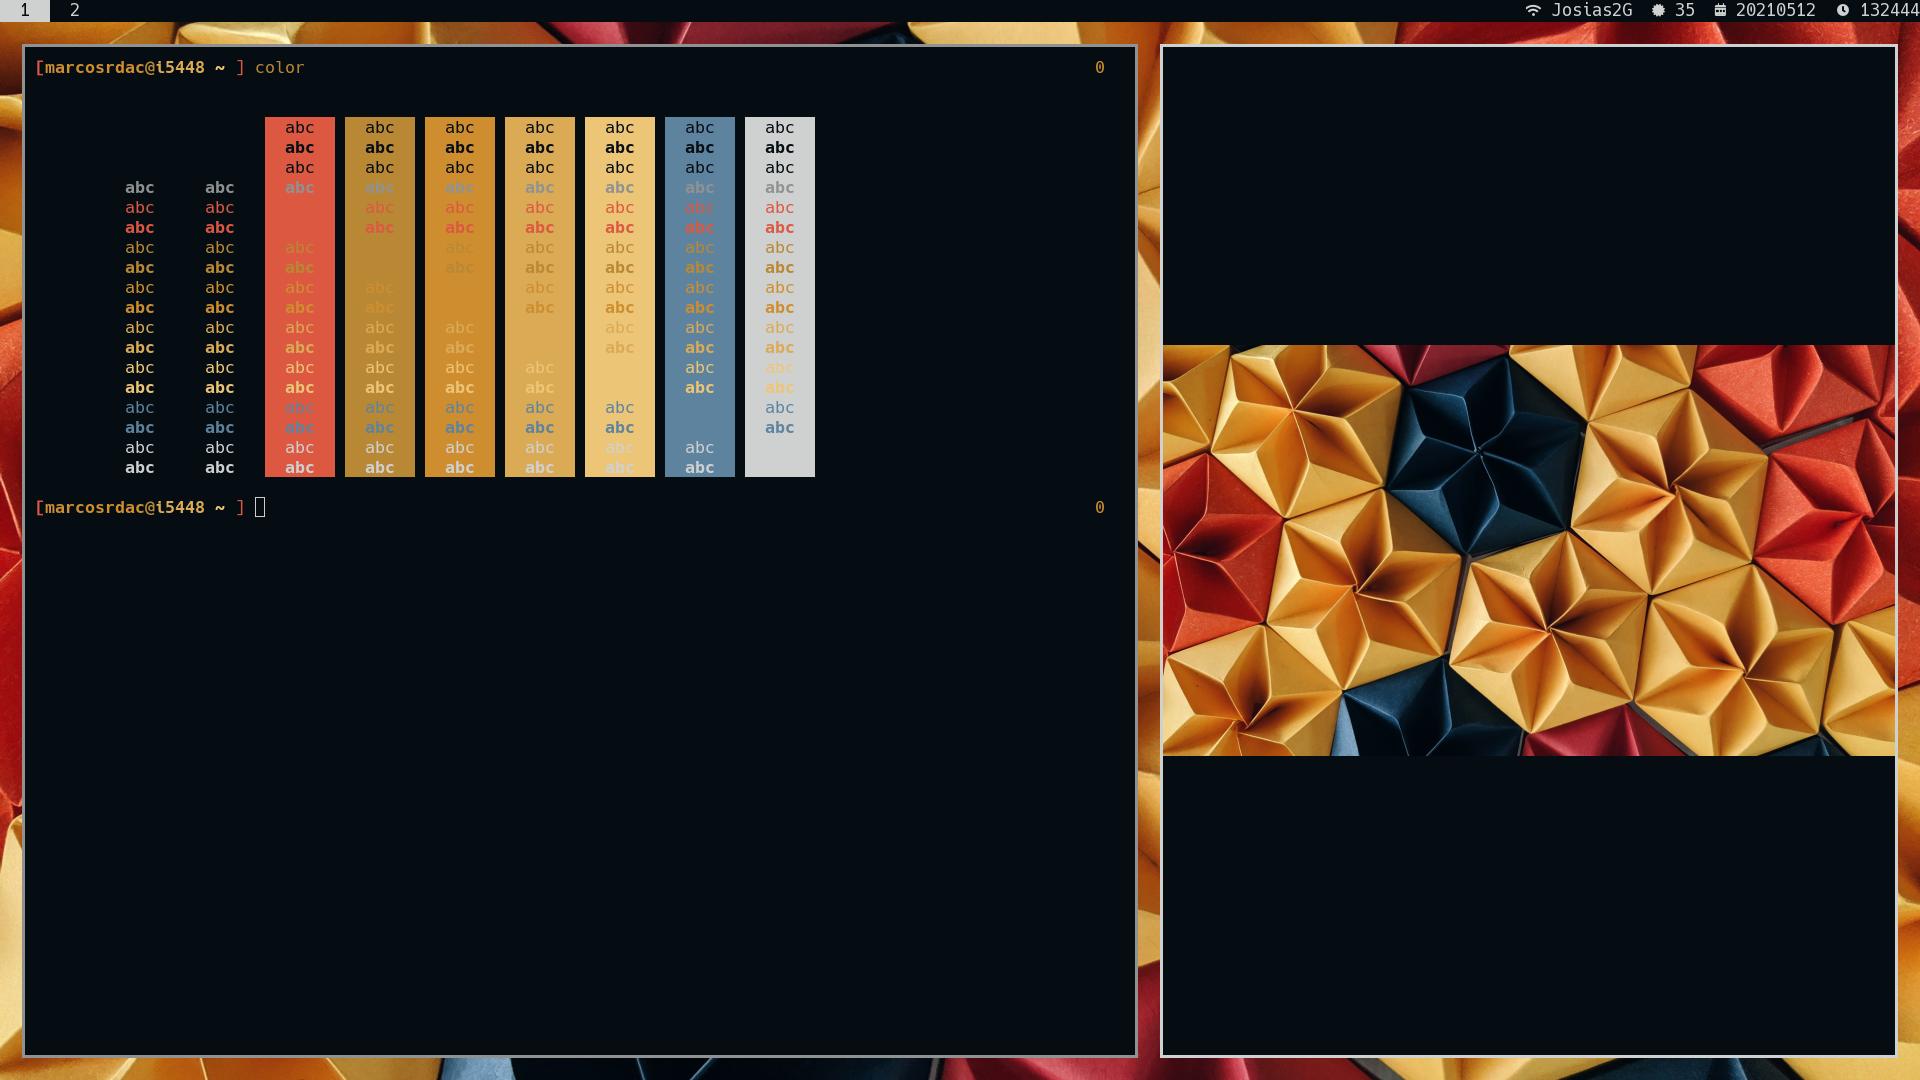 20210512132444_screenshot_1920x1080